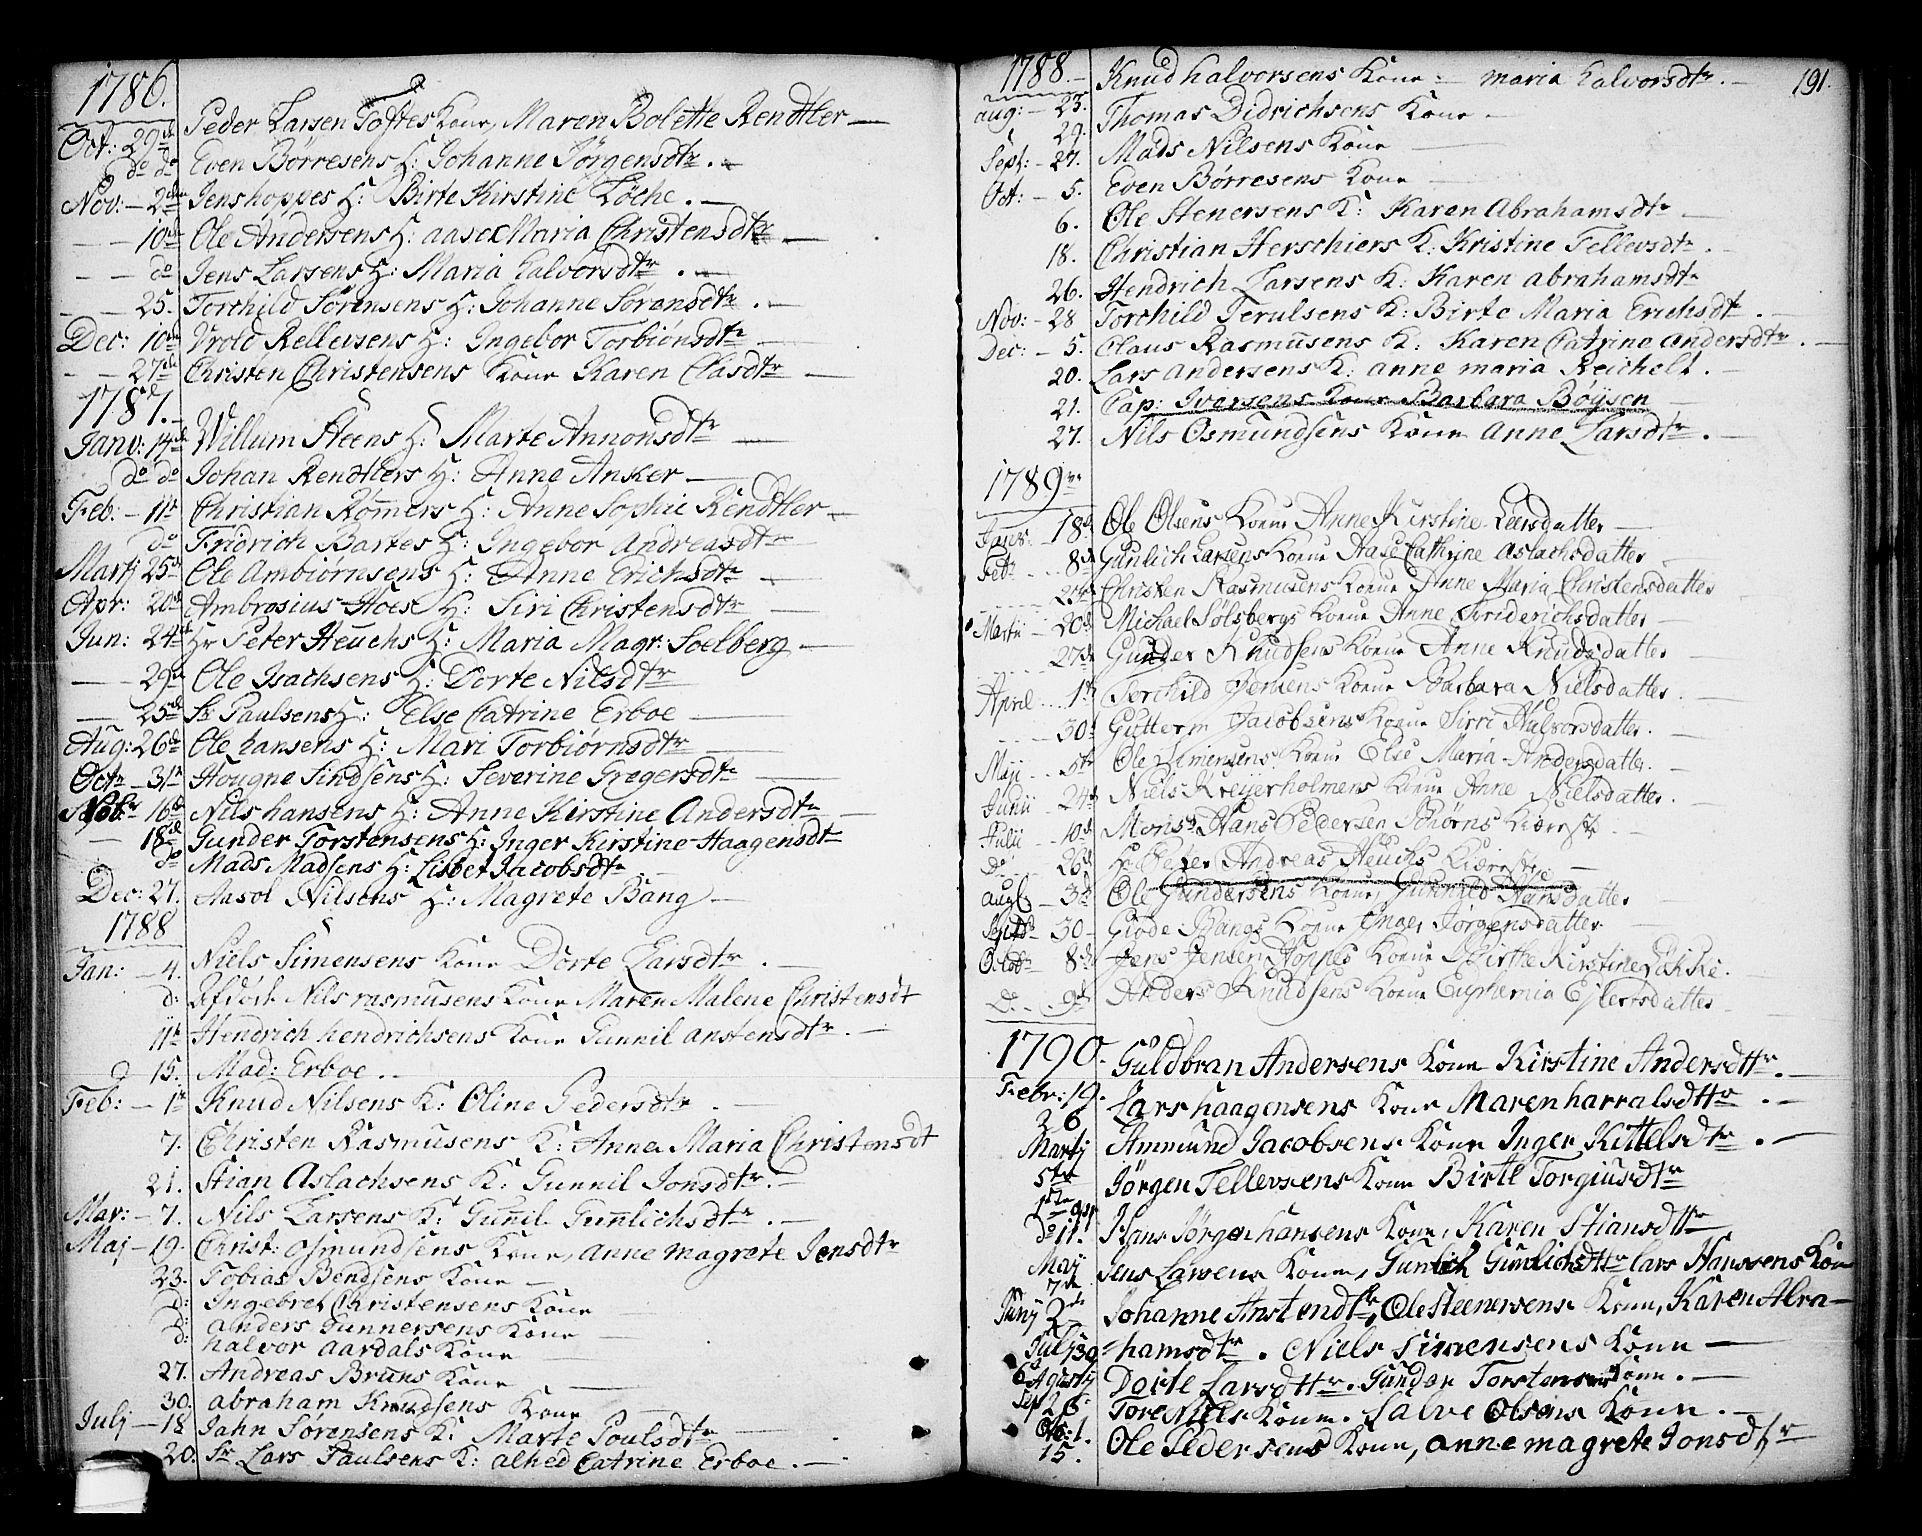 SAKO, Kragerø kirkebøker, F/Fa/L0002: Ministerialbok nr. 2, 1767-1802, s. 191